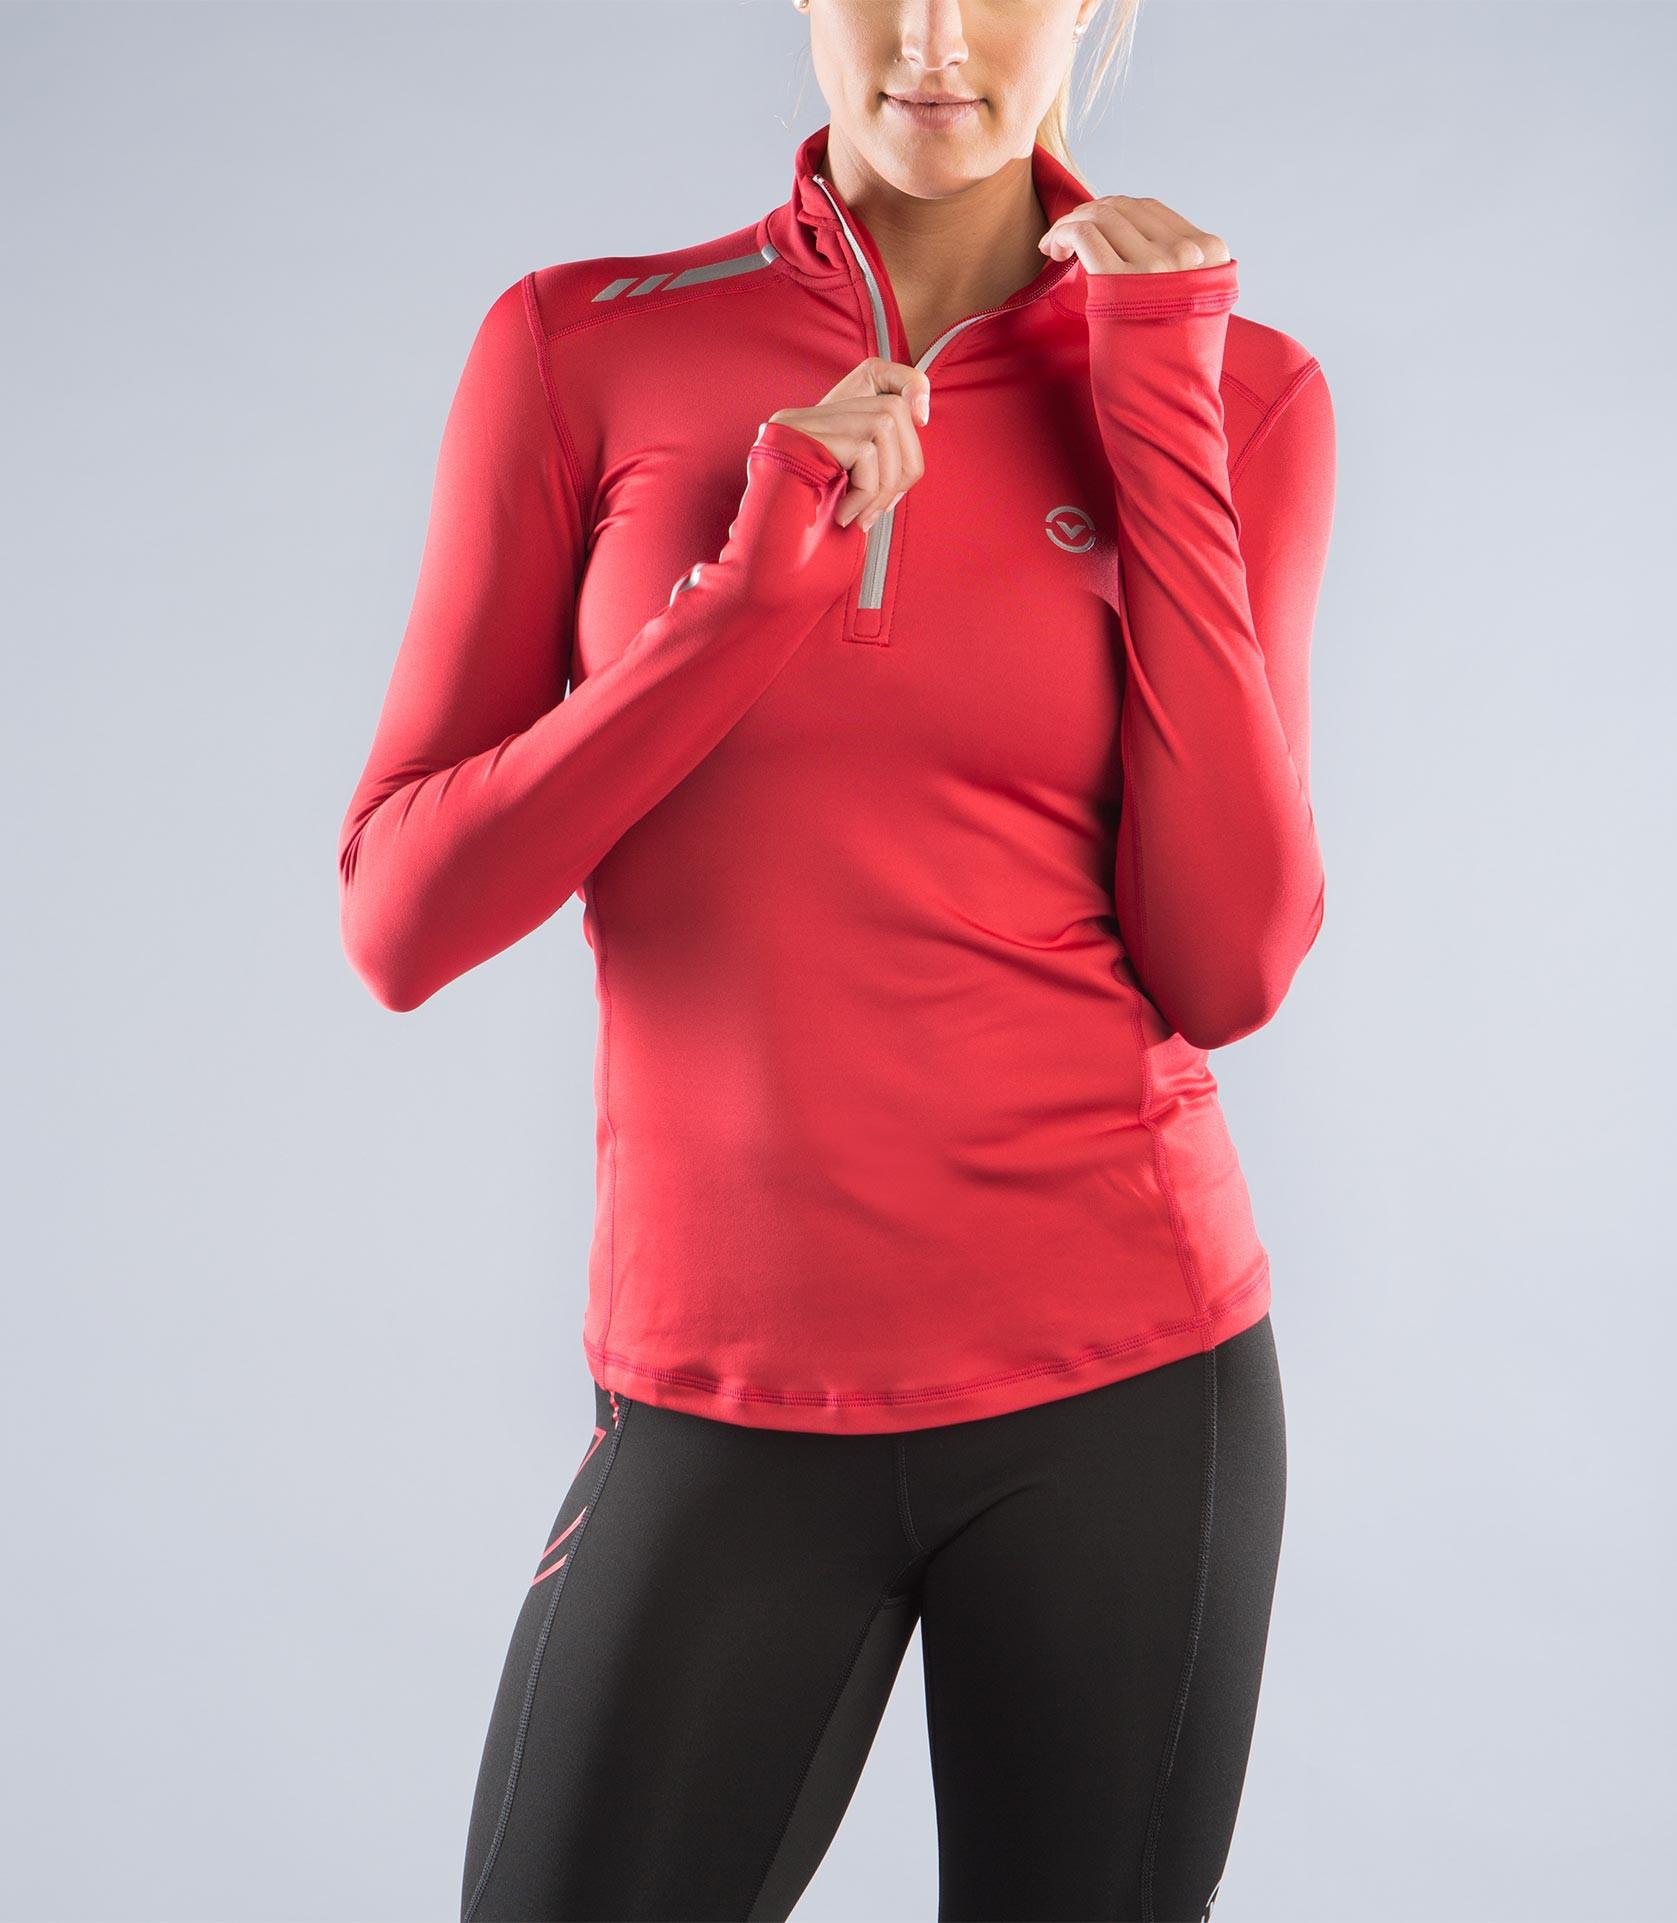 ESiO1女子咖啡紗長袖半拉鍊功能性保暖衣